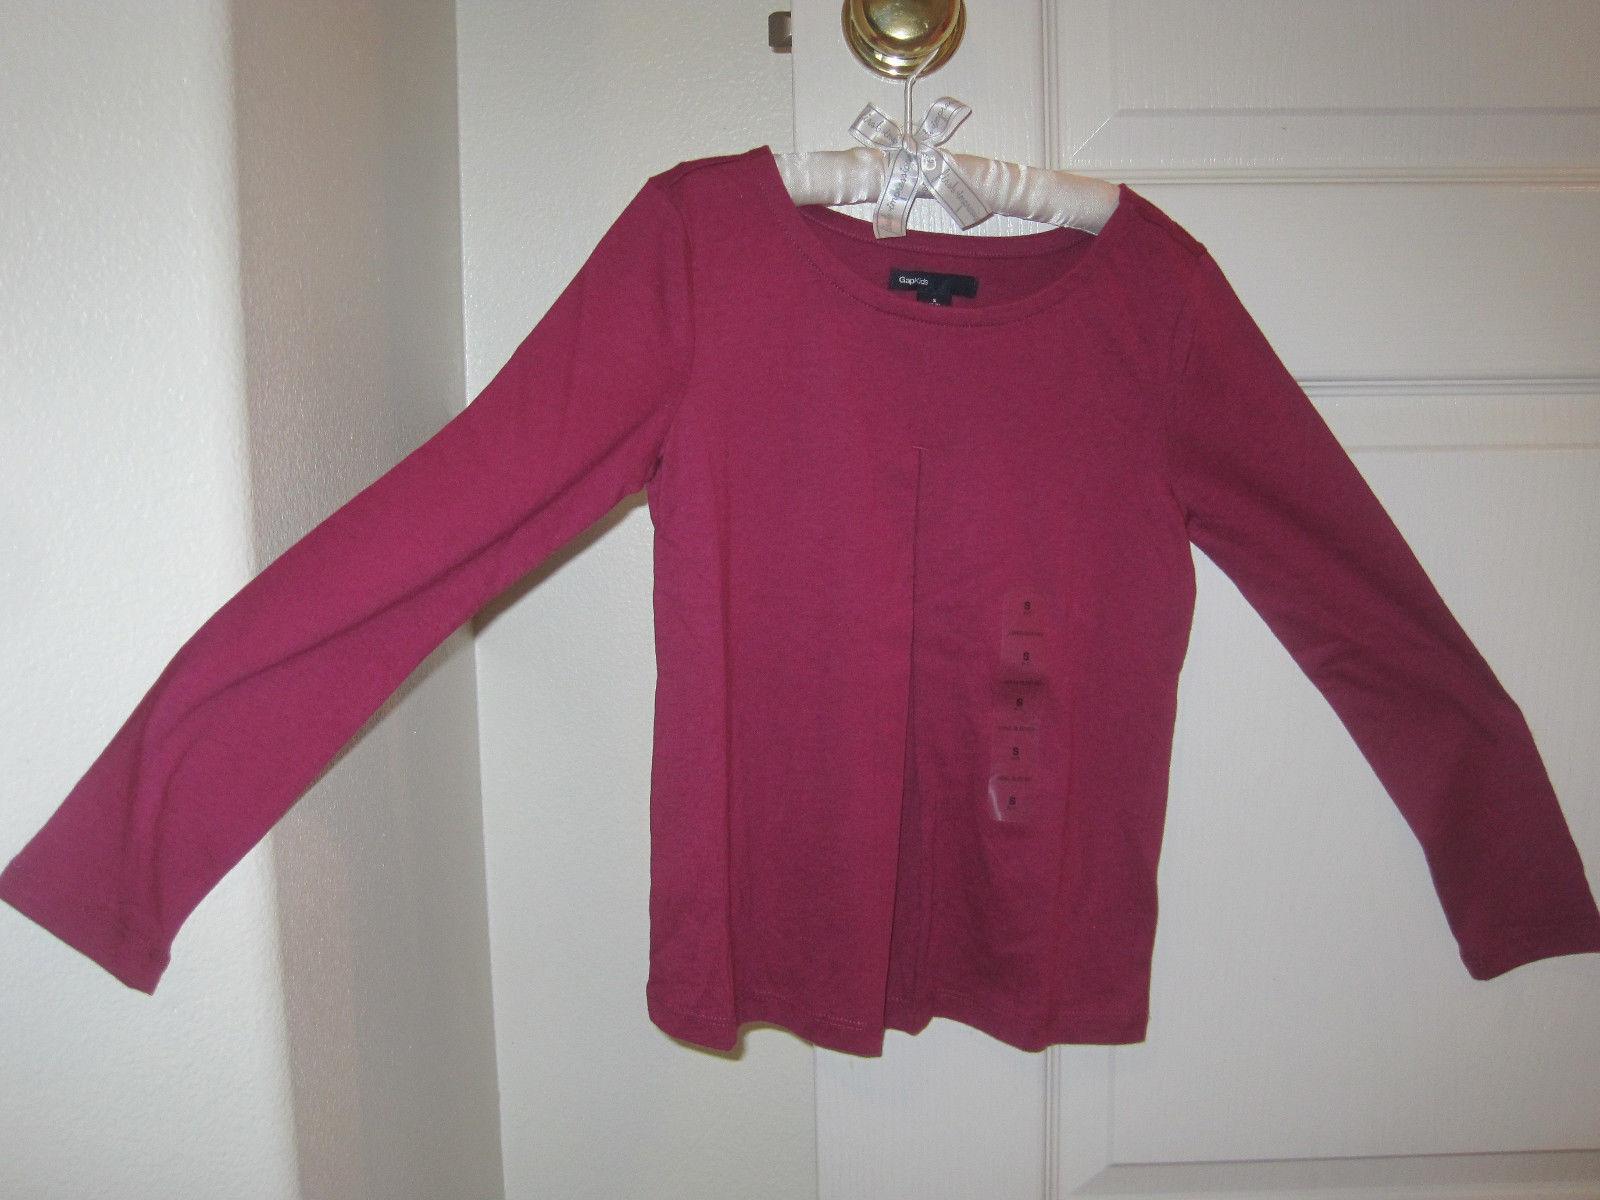 GAP Kids Girl T-shirt Tee Sz S 6 7 Long Sleeve Pleated  Hot Pink Cotton Top New